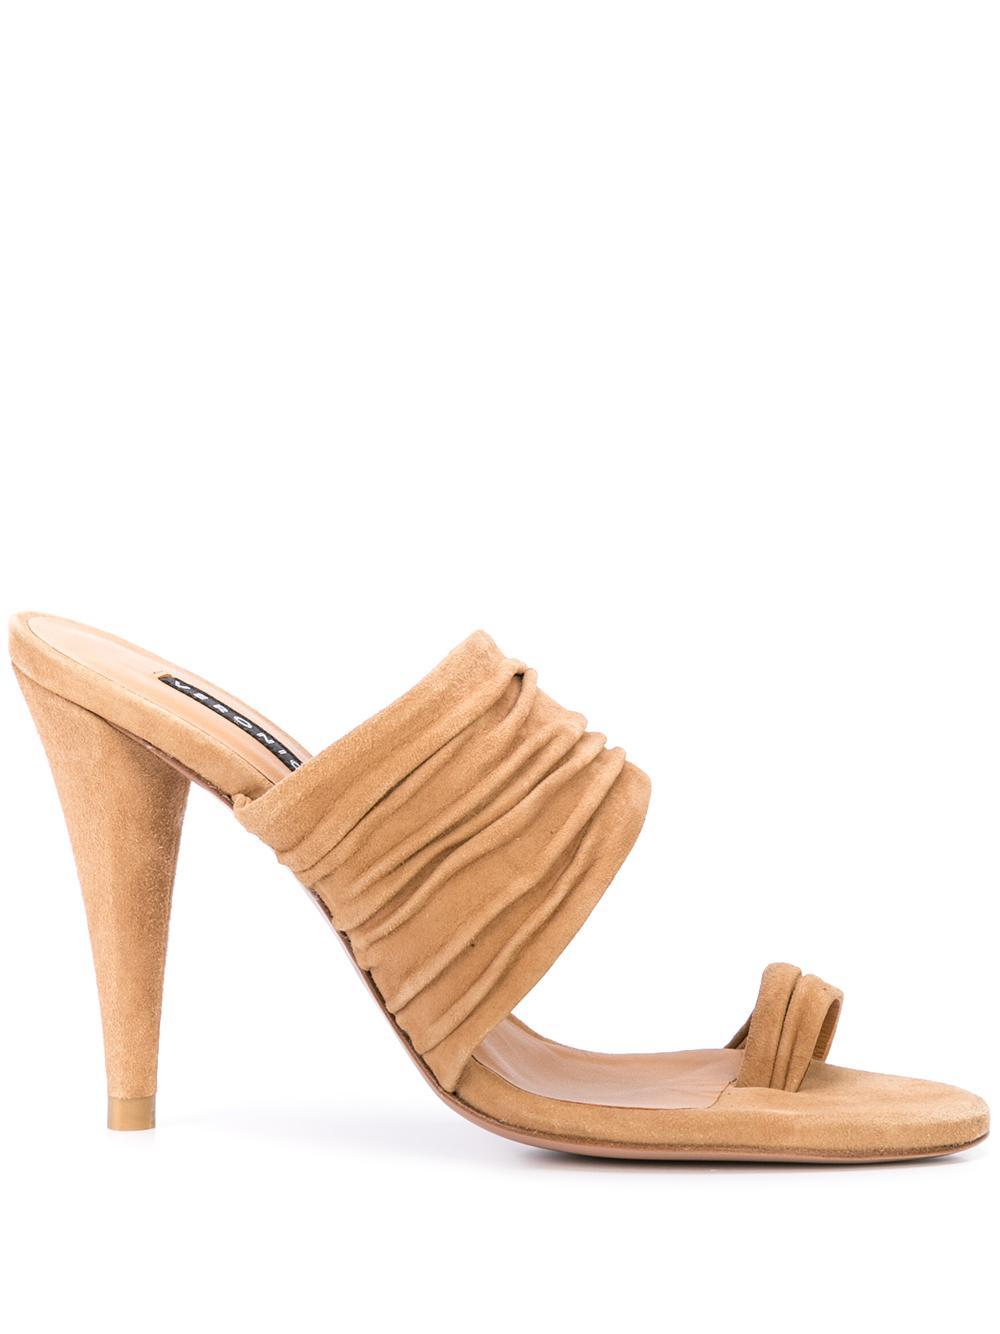 Orla Toe Ring High Heel Sandal Item # F190612FS